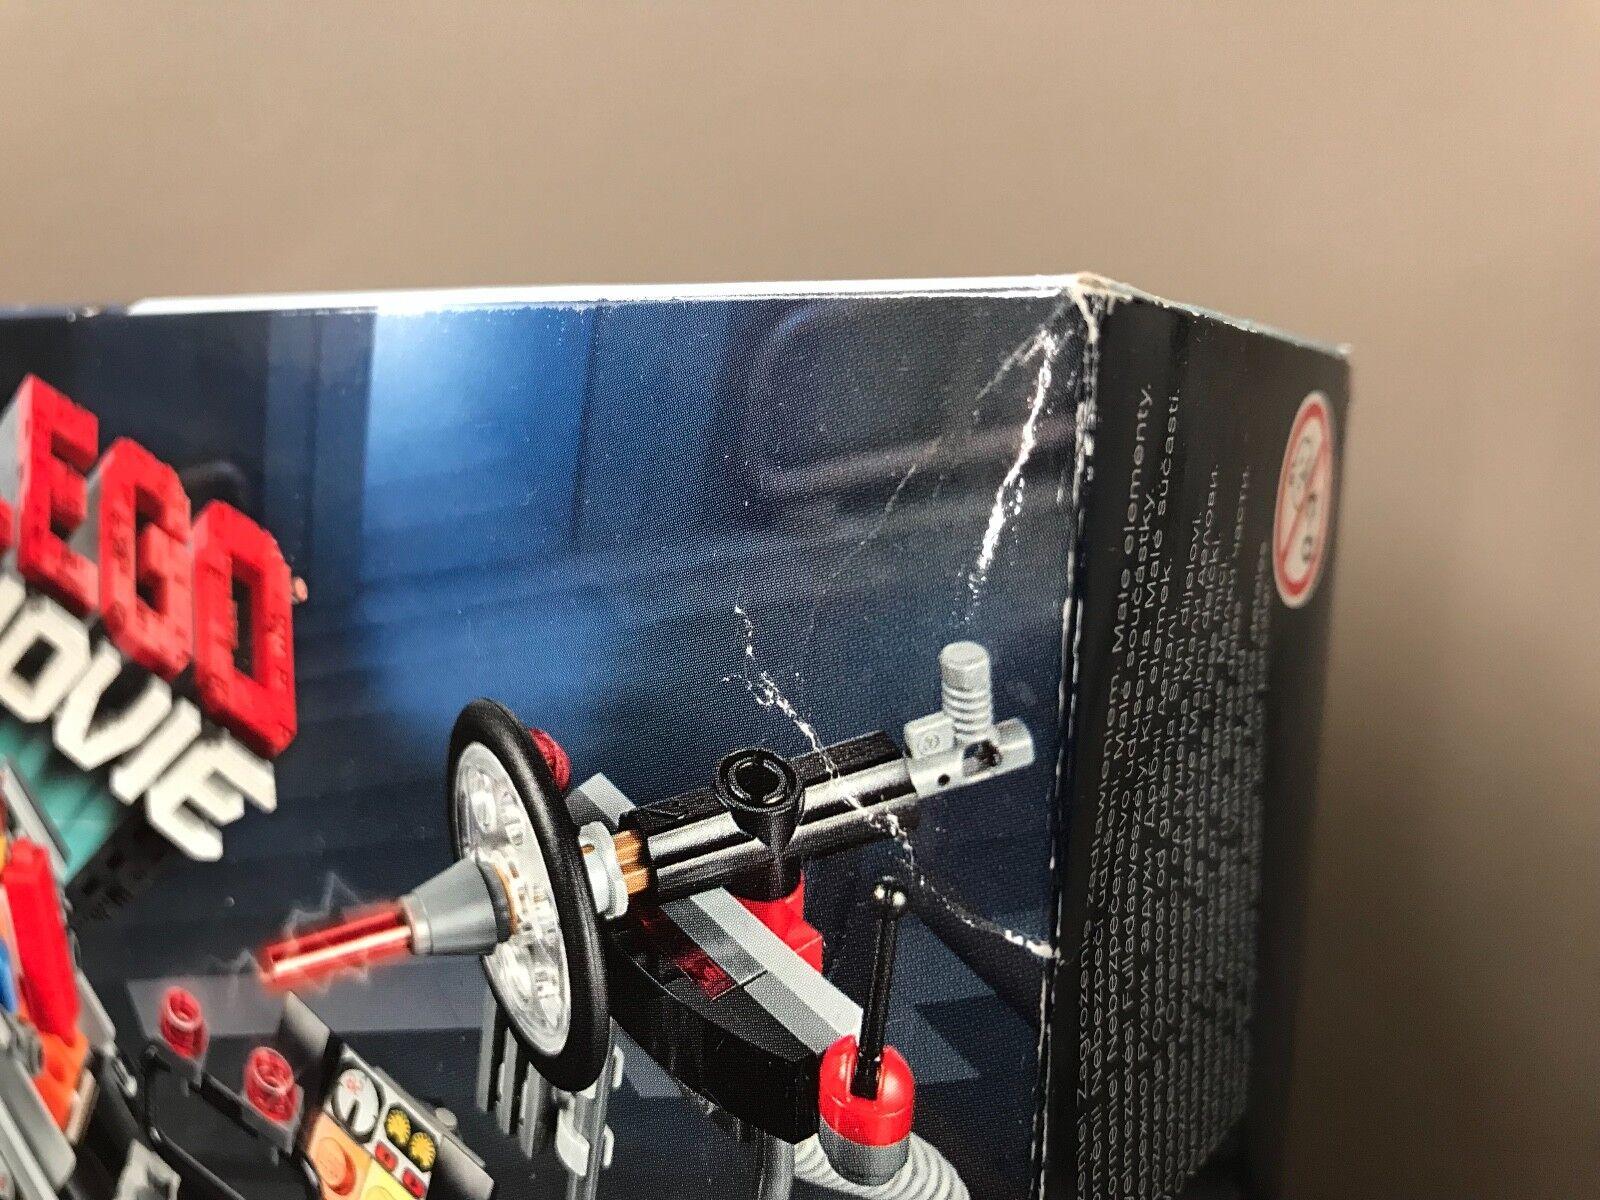 Lego The Movie - LEGO 70801 Melting Melting Melting Room NEW in box    Box Not Mint 07a6f5